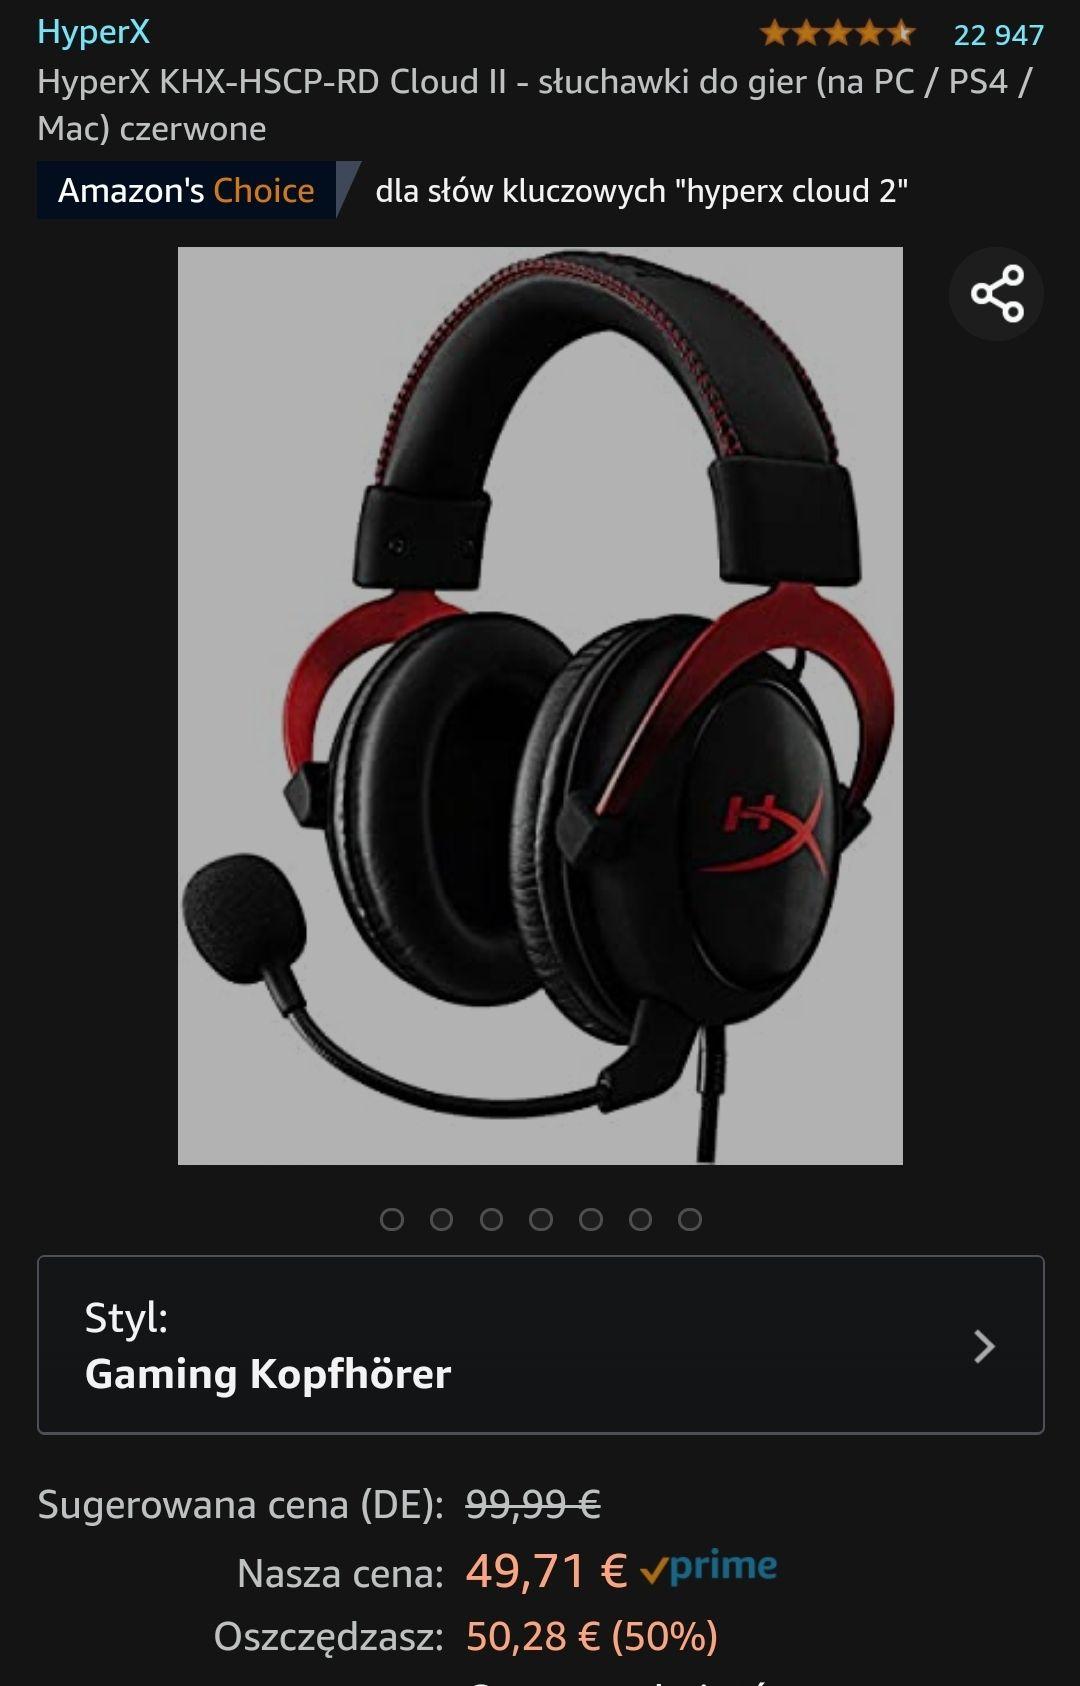 Słuchawki HyperX KHX-HSCP-RD Cloud II